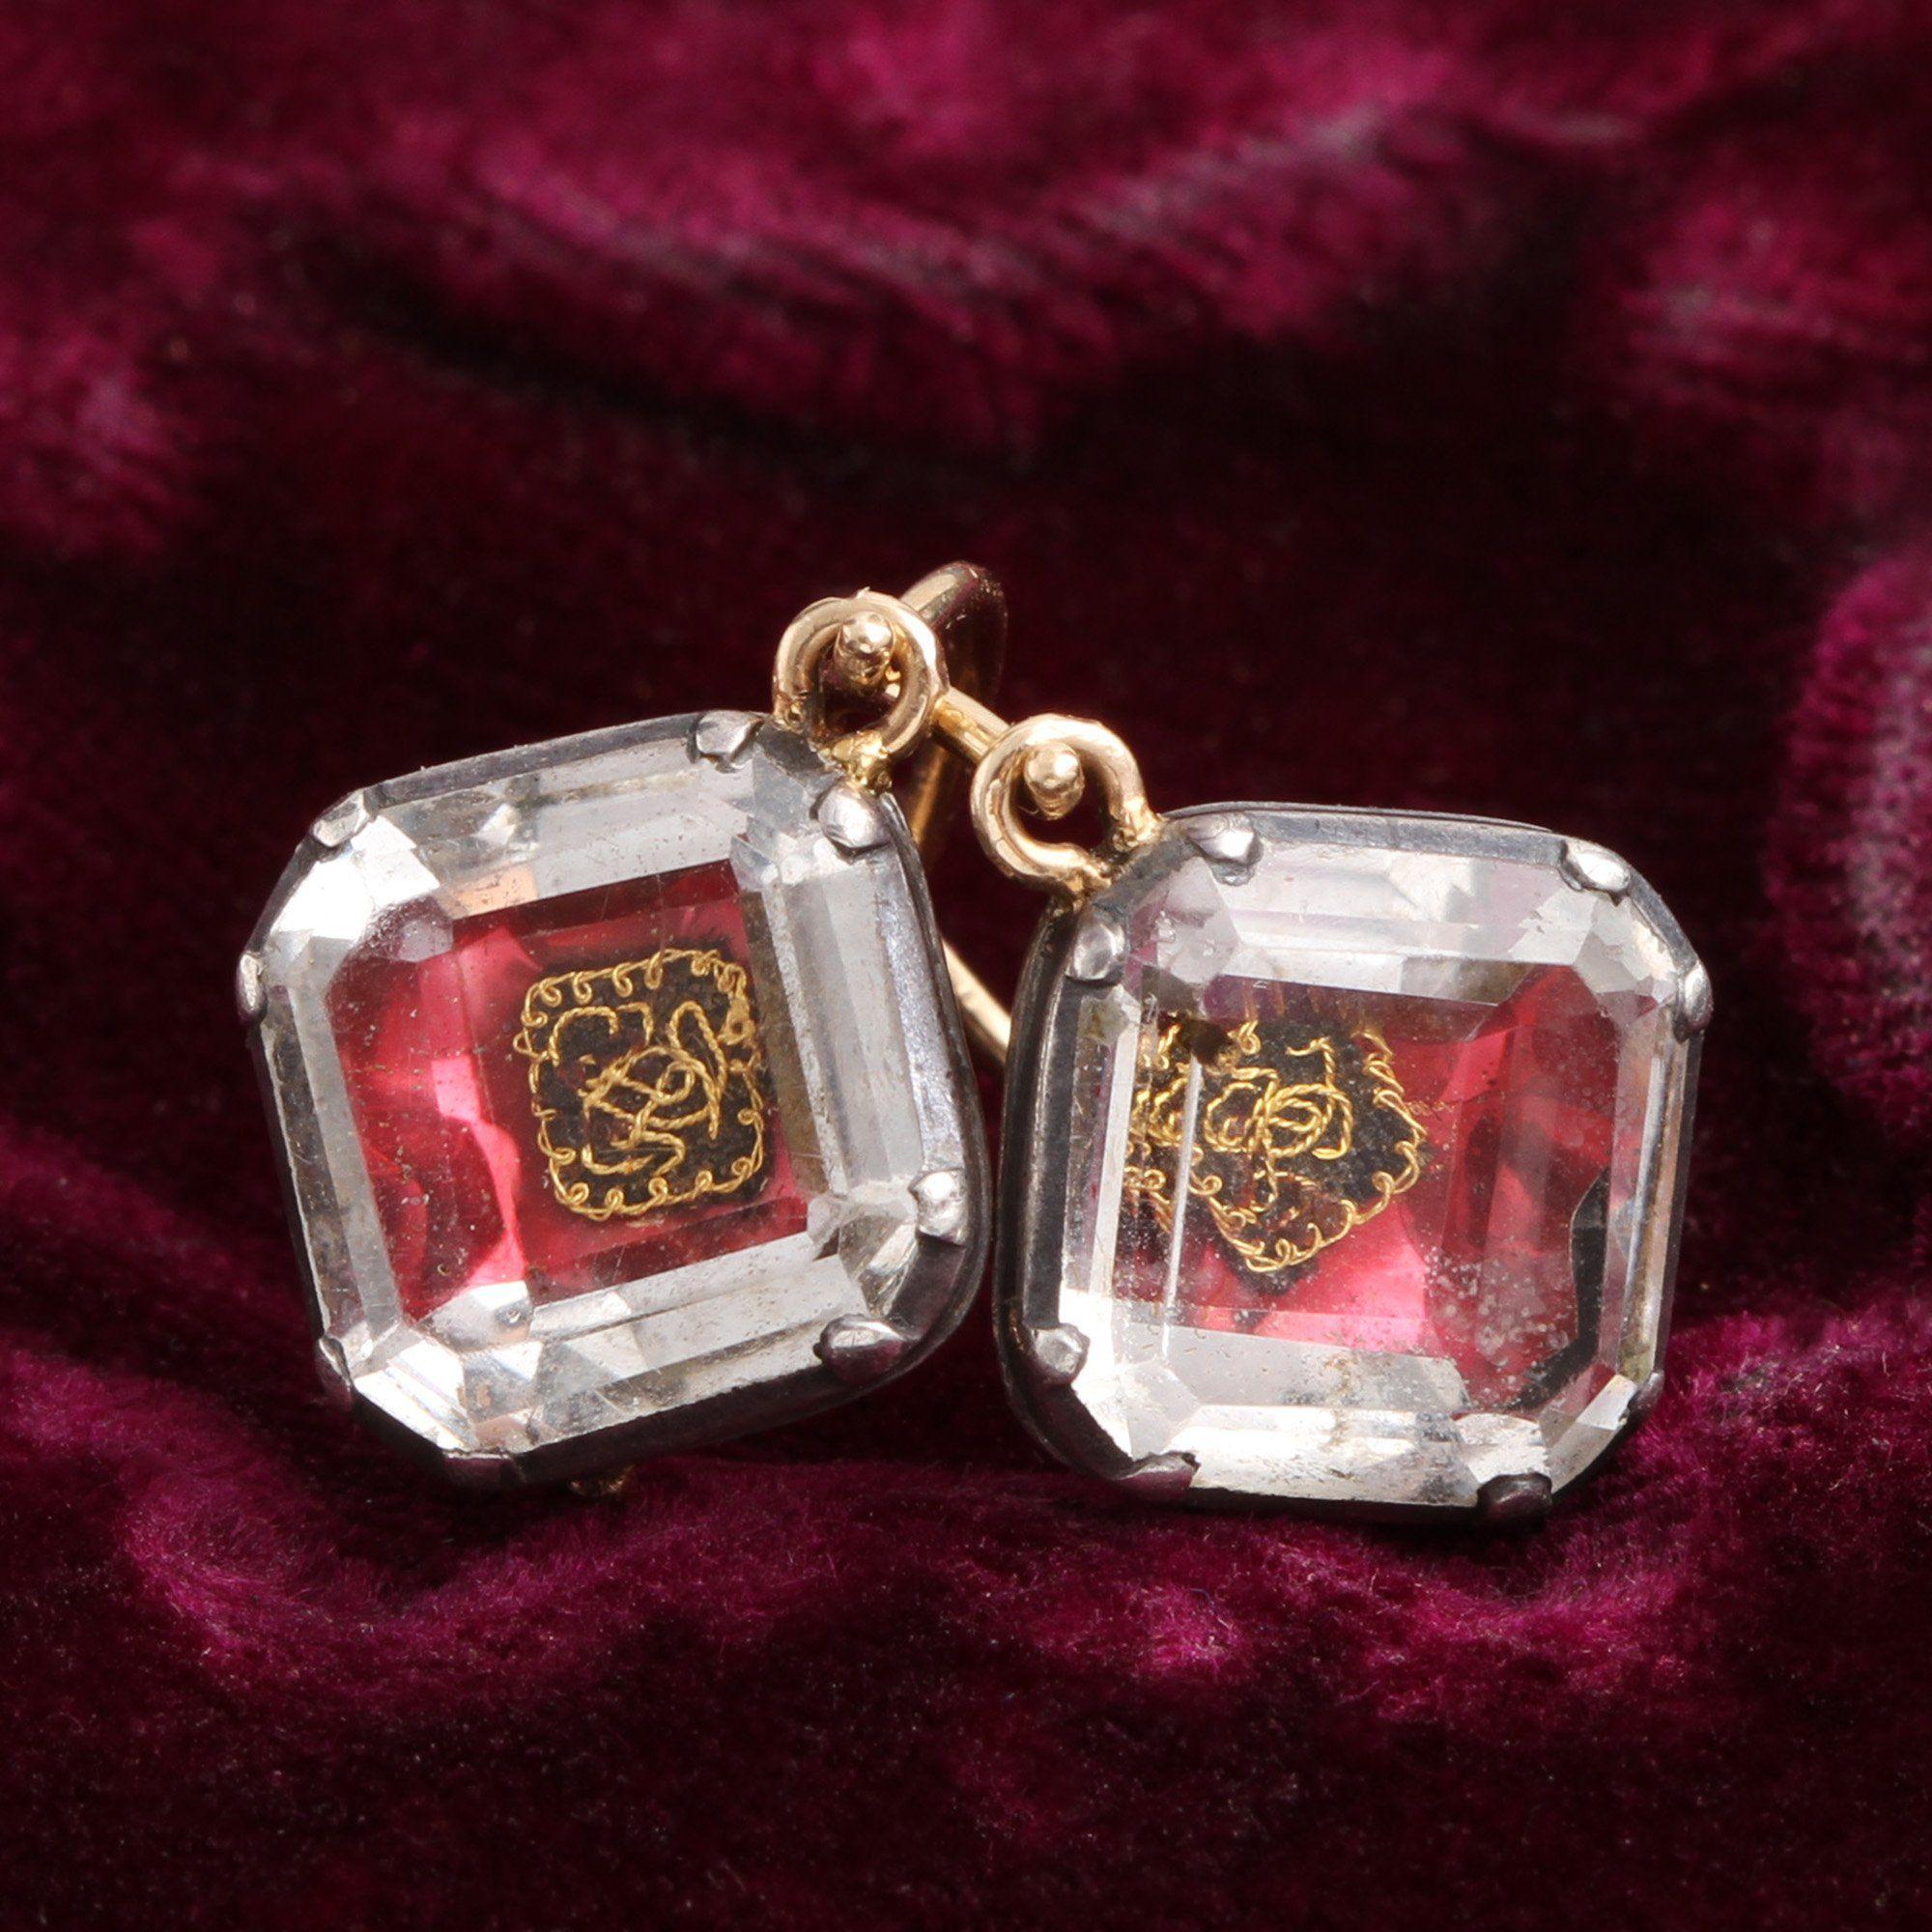 Pink Stuart Crystal earrings detail